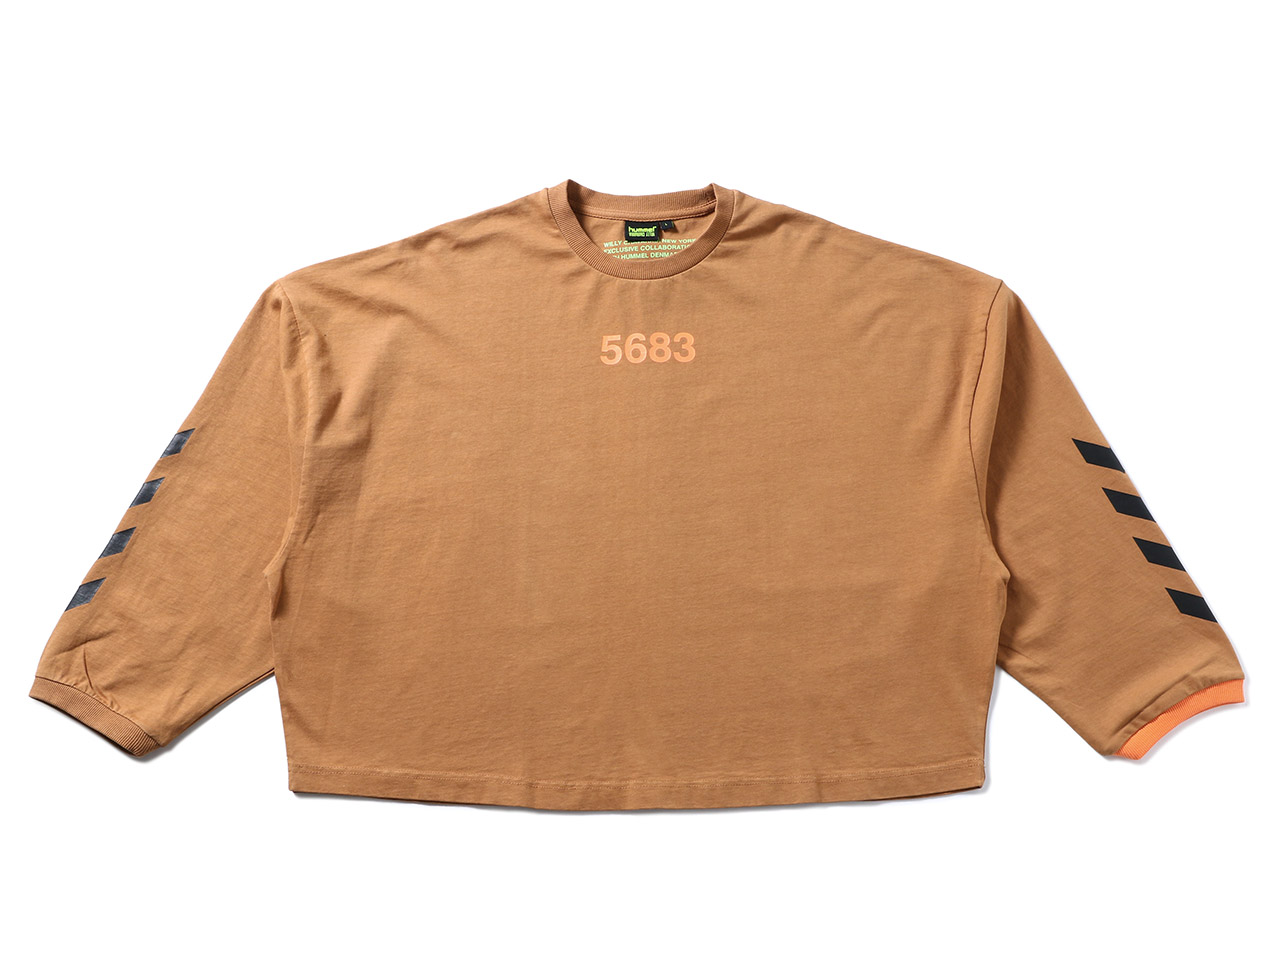 【10%OFF!】WILLY CHAVARRIA hmlWILLY RUFF NECK T-SHIRT L/S(207469)【ウィリーチャバリア】【メンズファッション】【トップス】【Tシャツ】【ストリート】